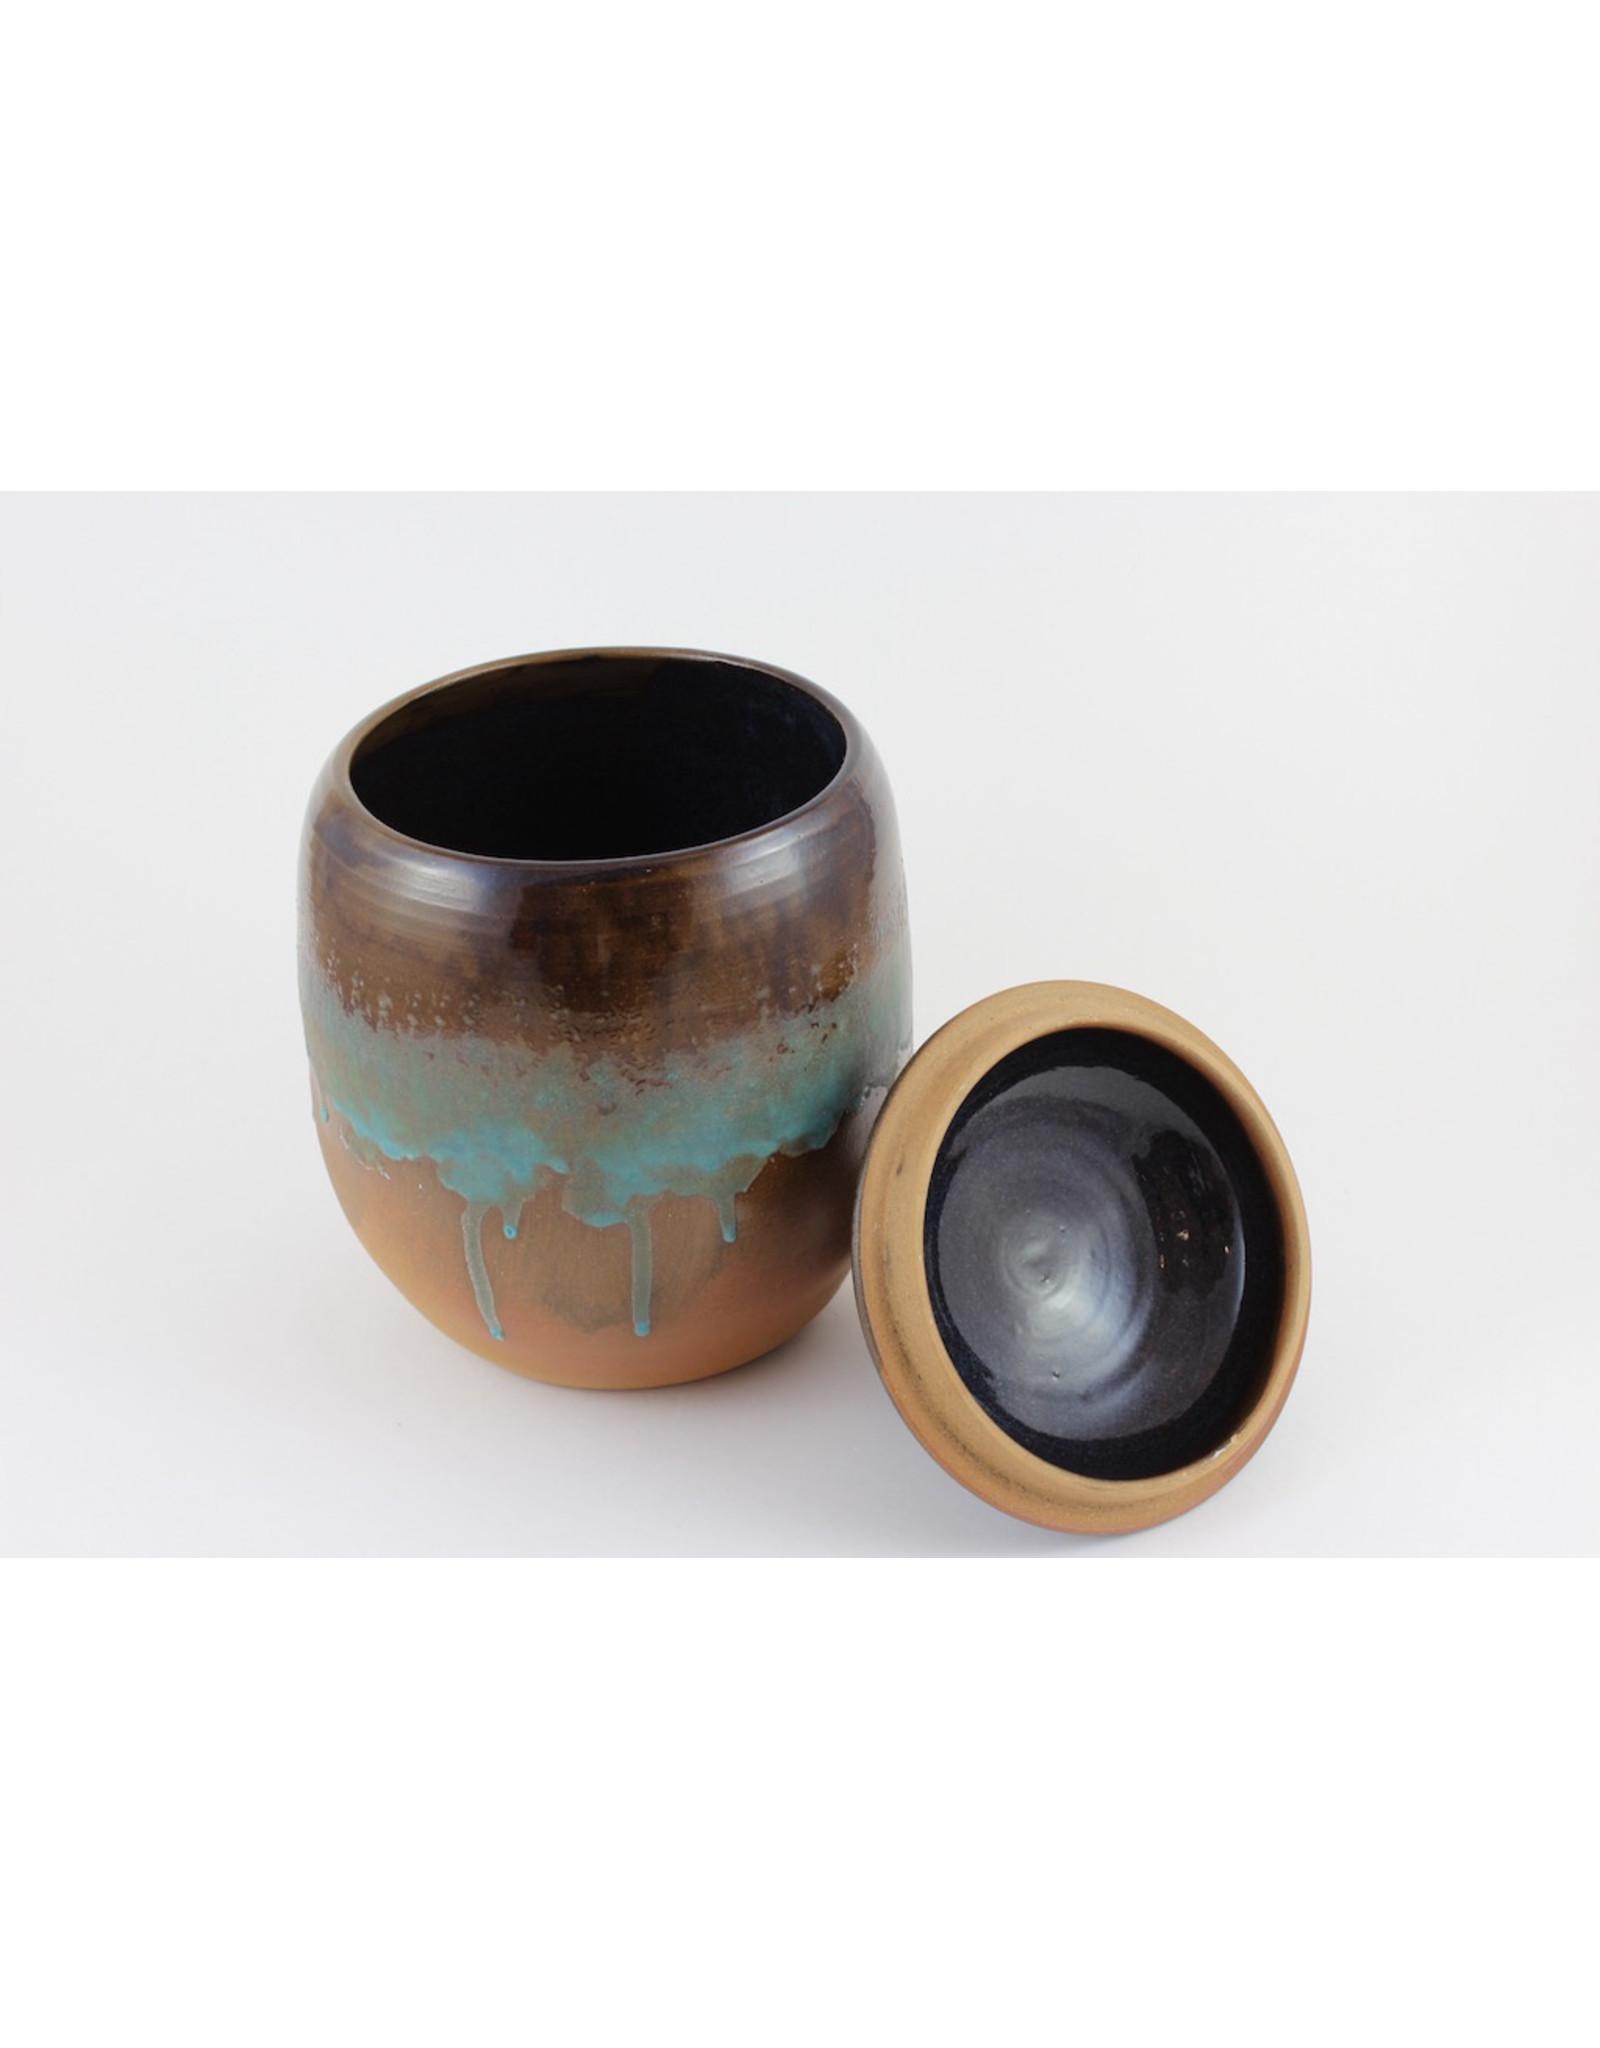 Jitka Zgola Brown Pot with Lid by Jitka Zgola